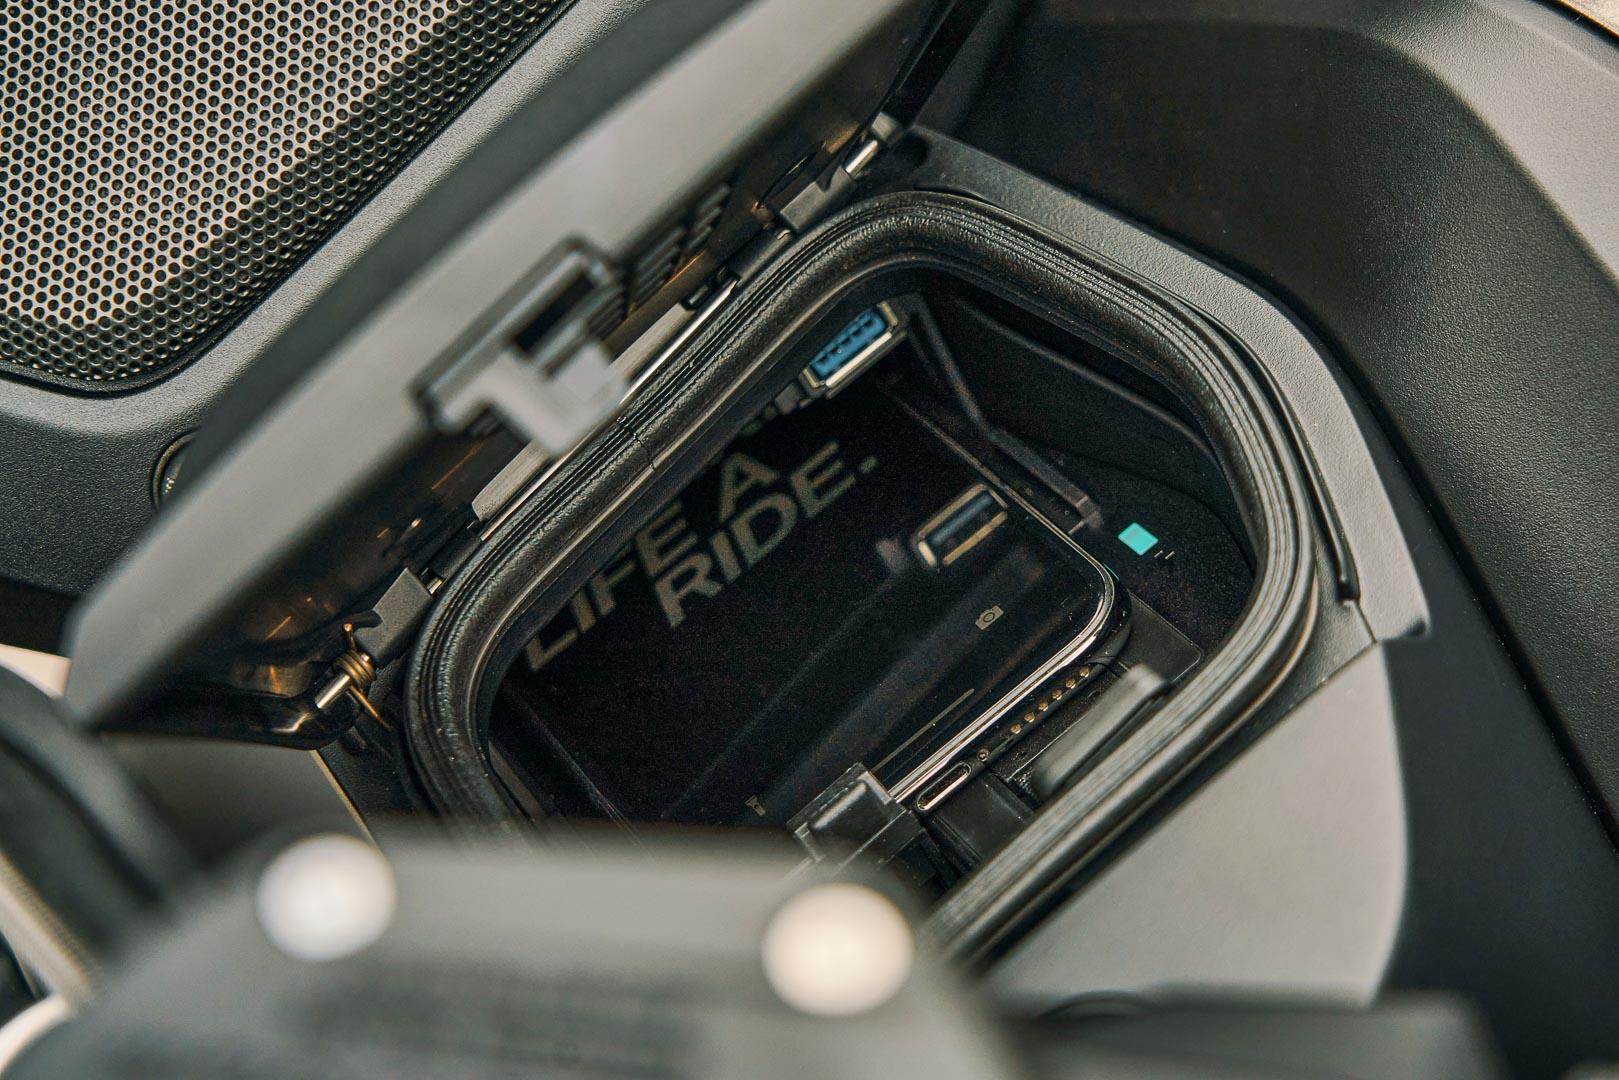 2021 BMW R 1250 RT: Specs